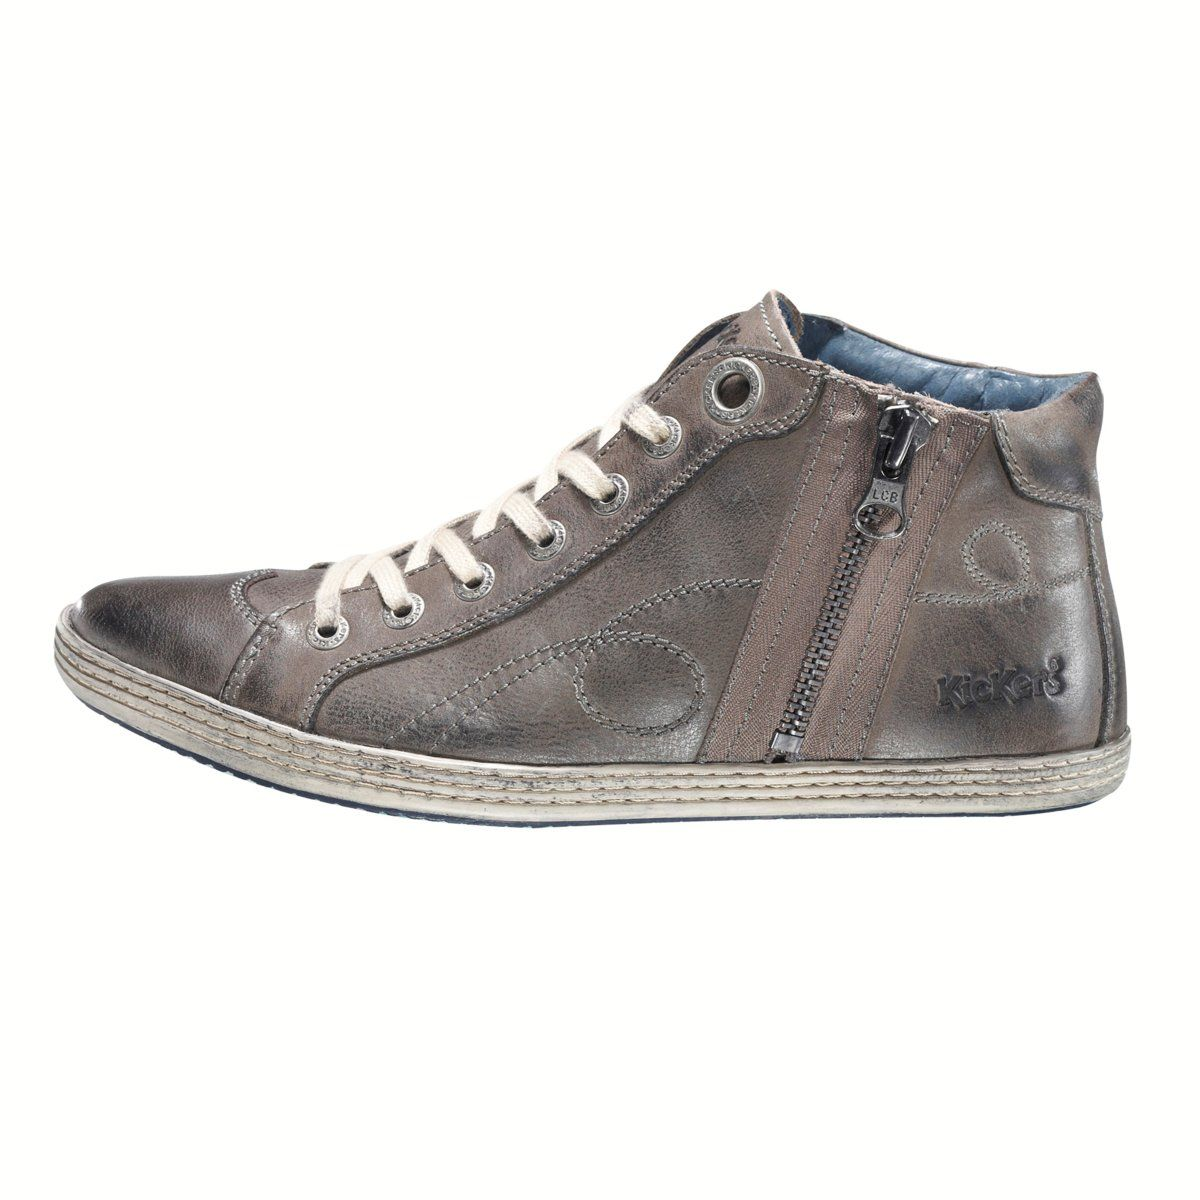 Kickers Amazon urban shoes.